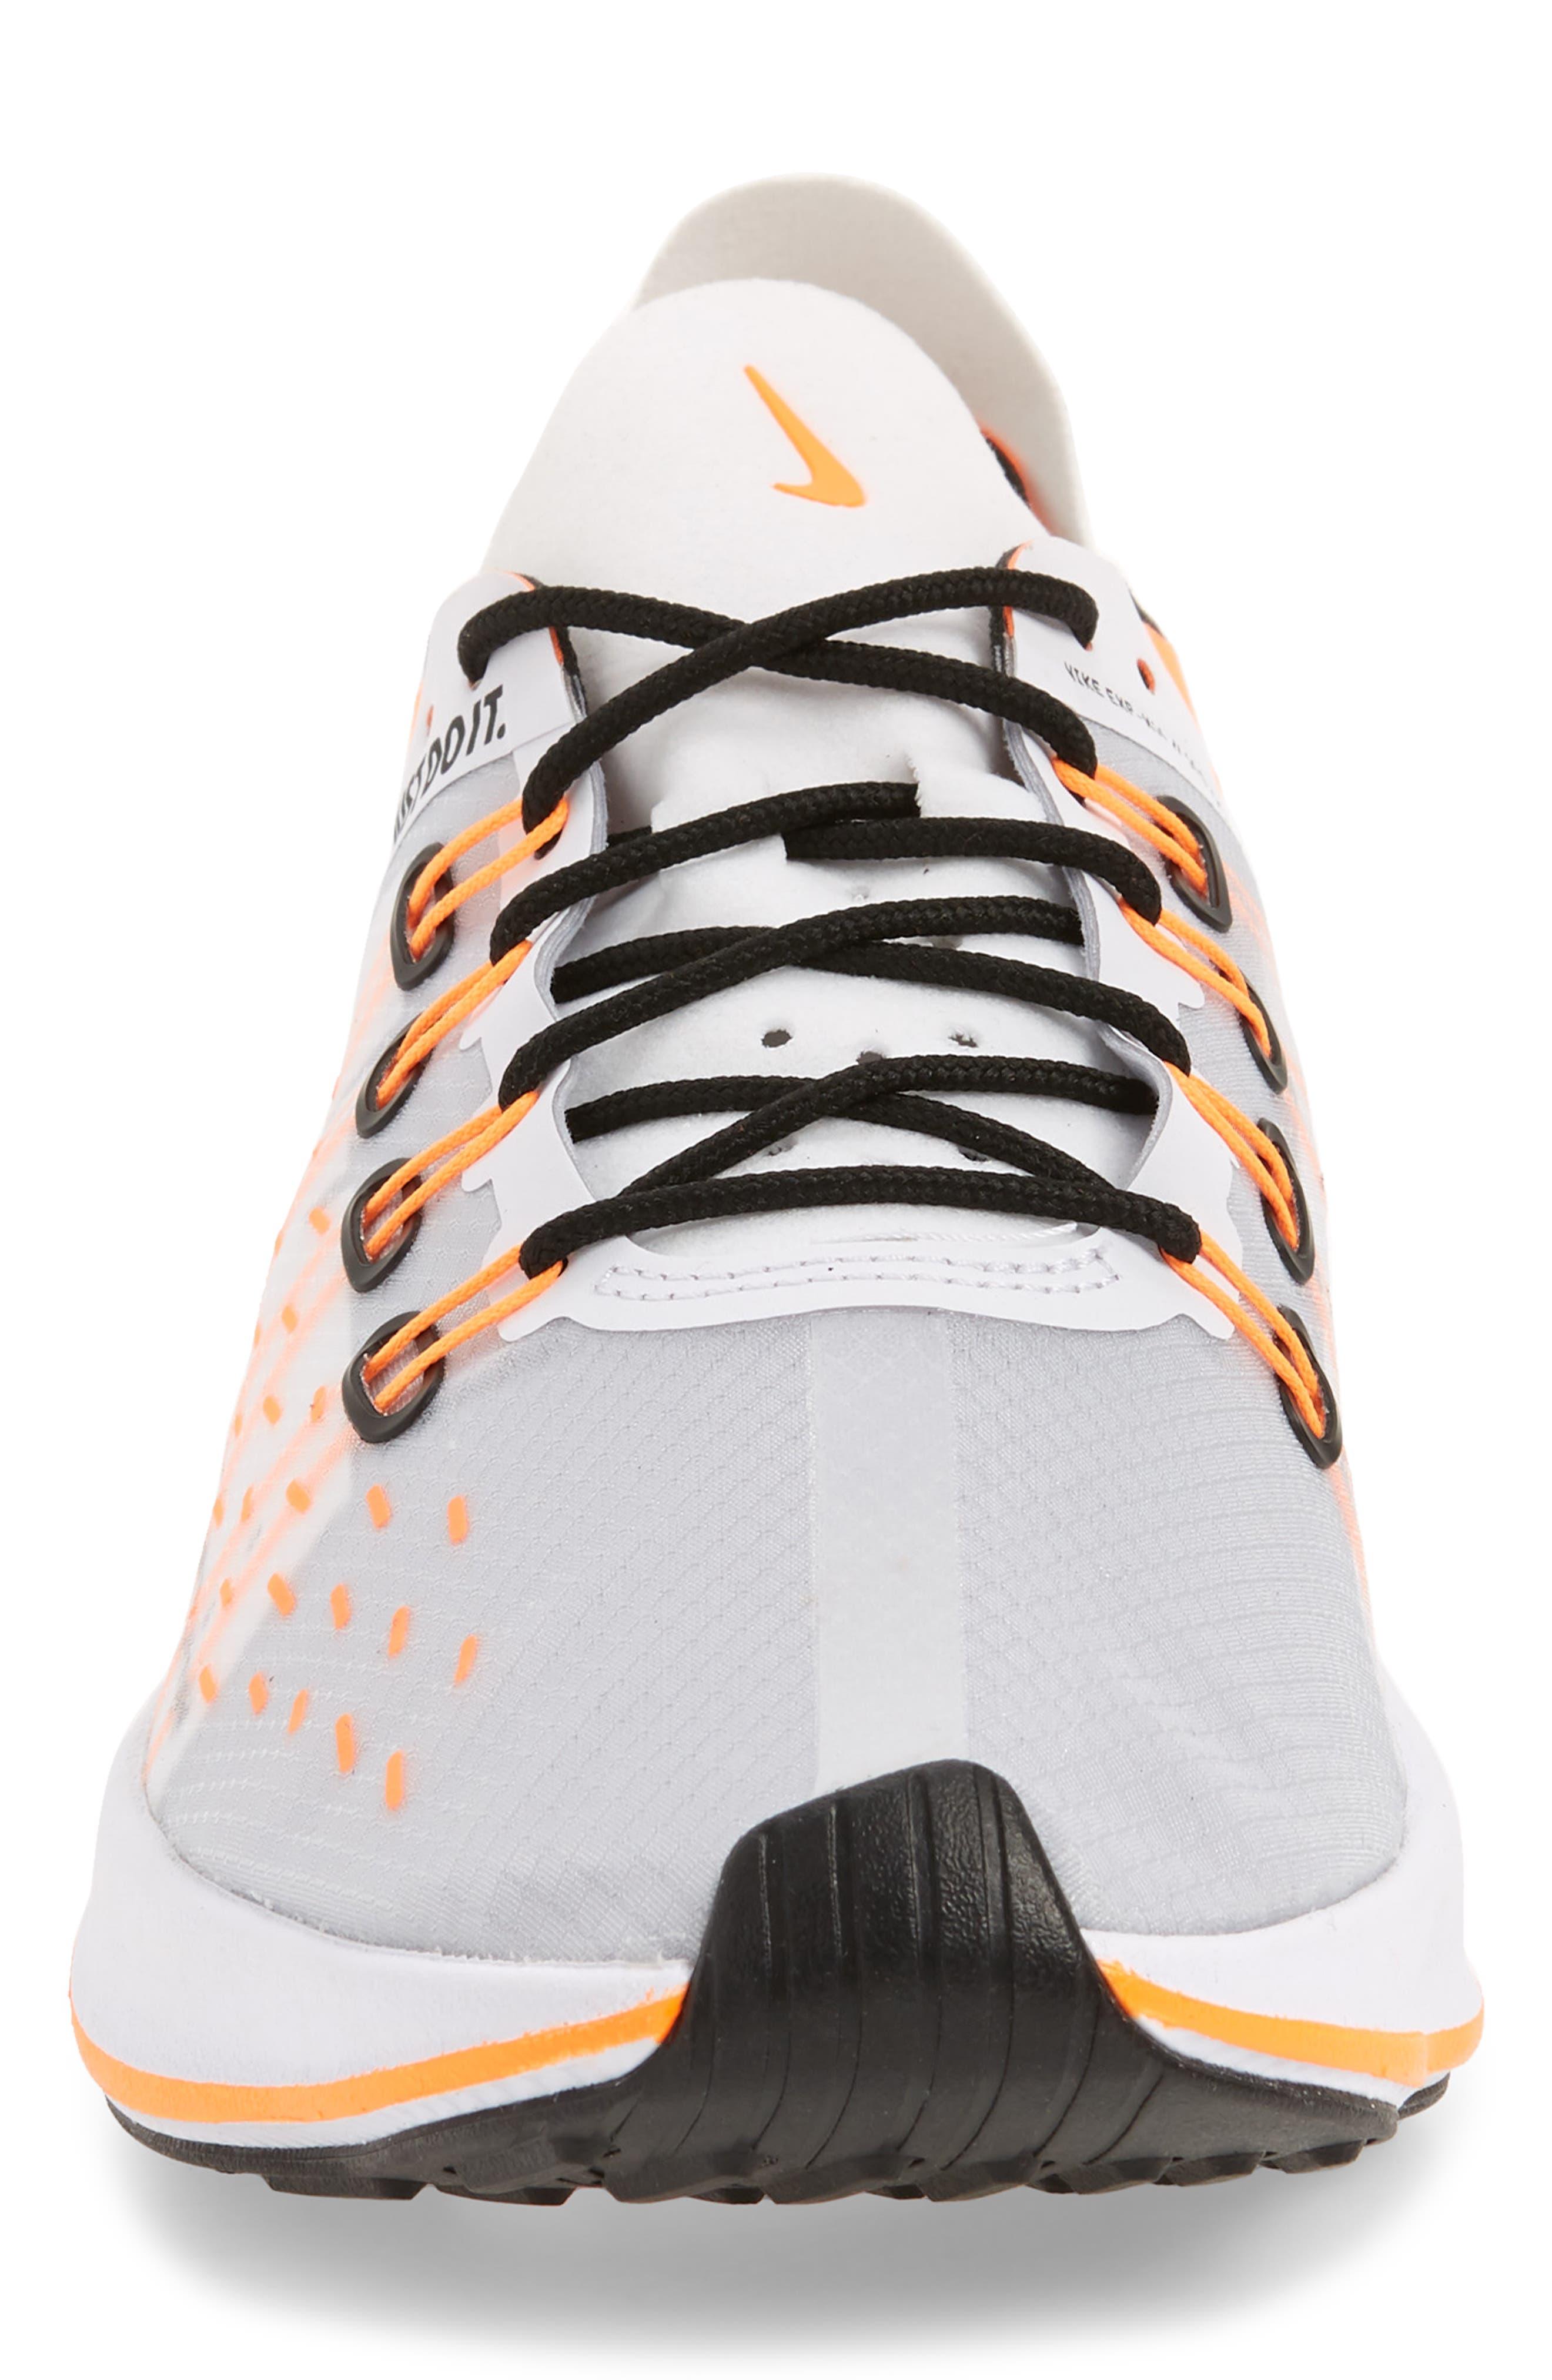 EXP-X14 Just Do It Sneaker,                             Alternate thumbnail 4, color,                             WHITE/ TOTAL ORANGE/ BLACK